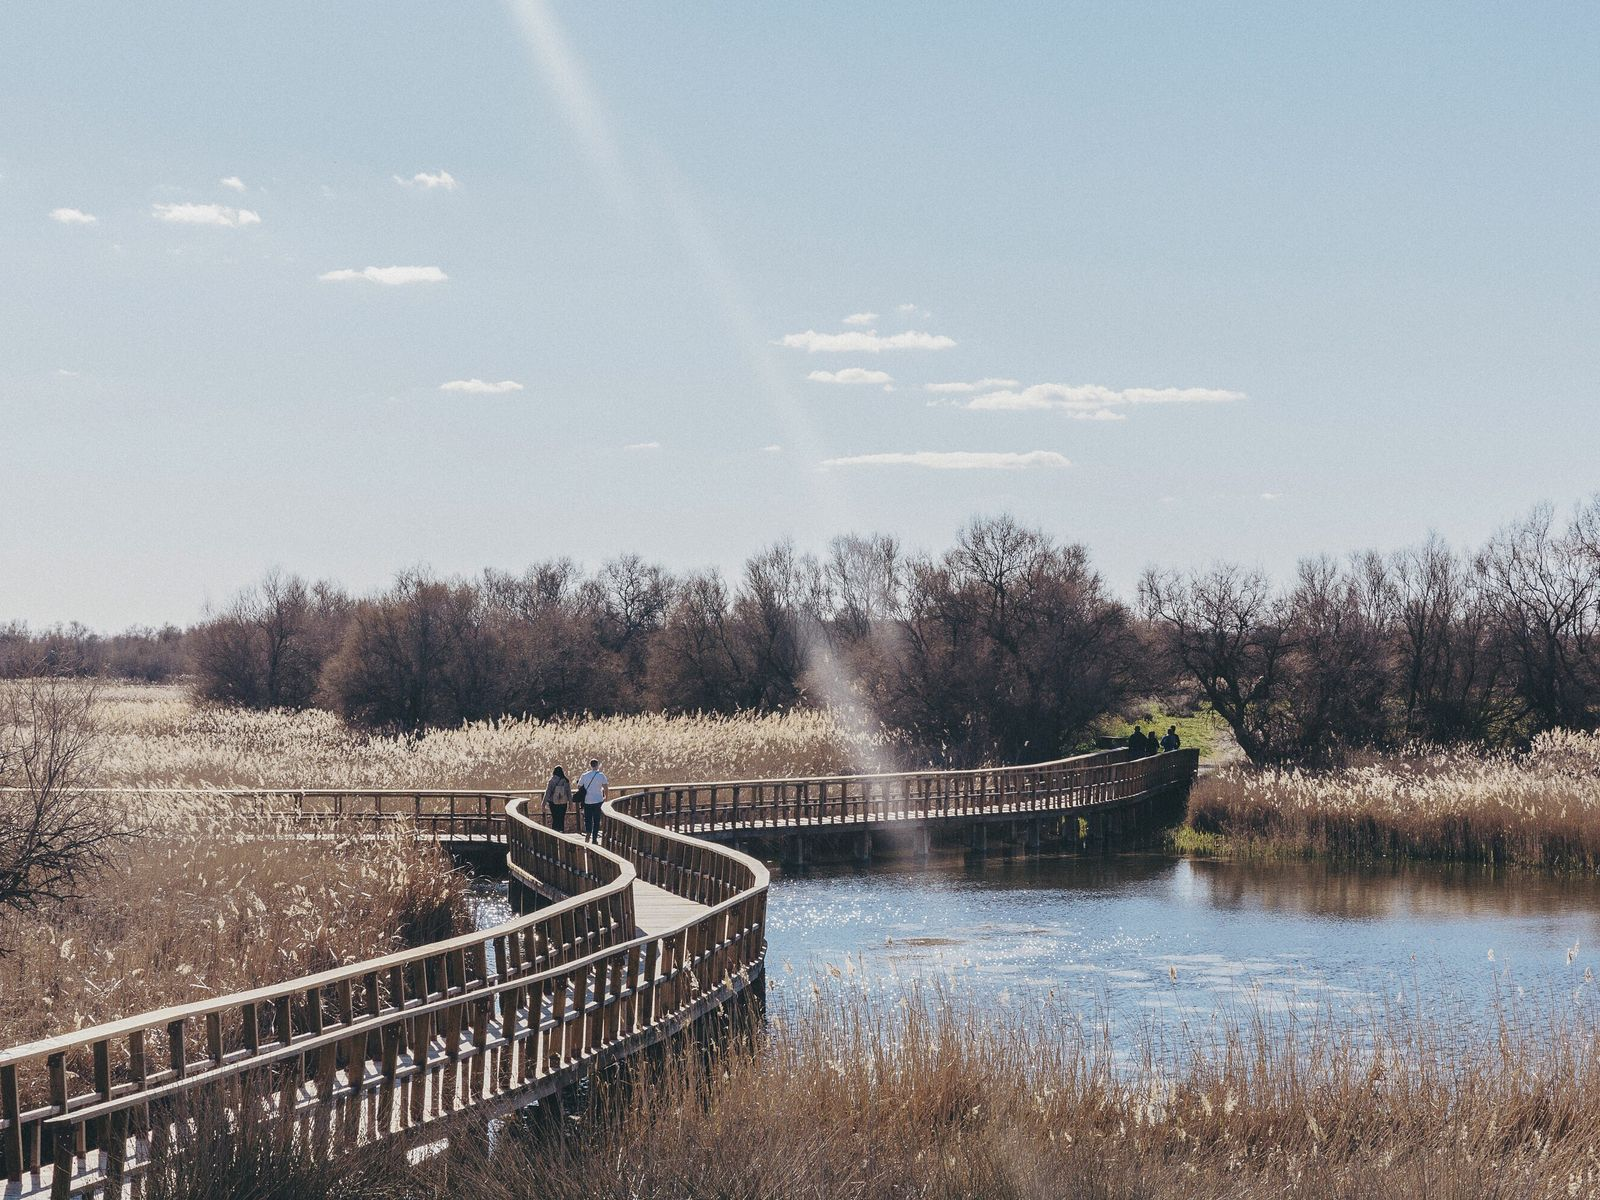 A boardwalk over wetlands at the Tablas de Daimiel National Park, Castile-La Mancha.